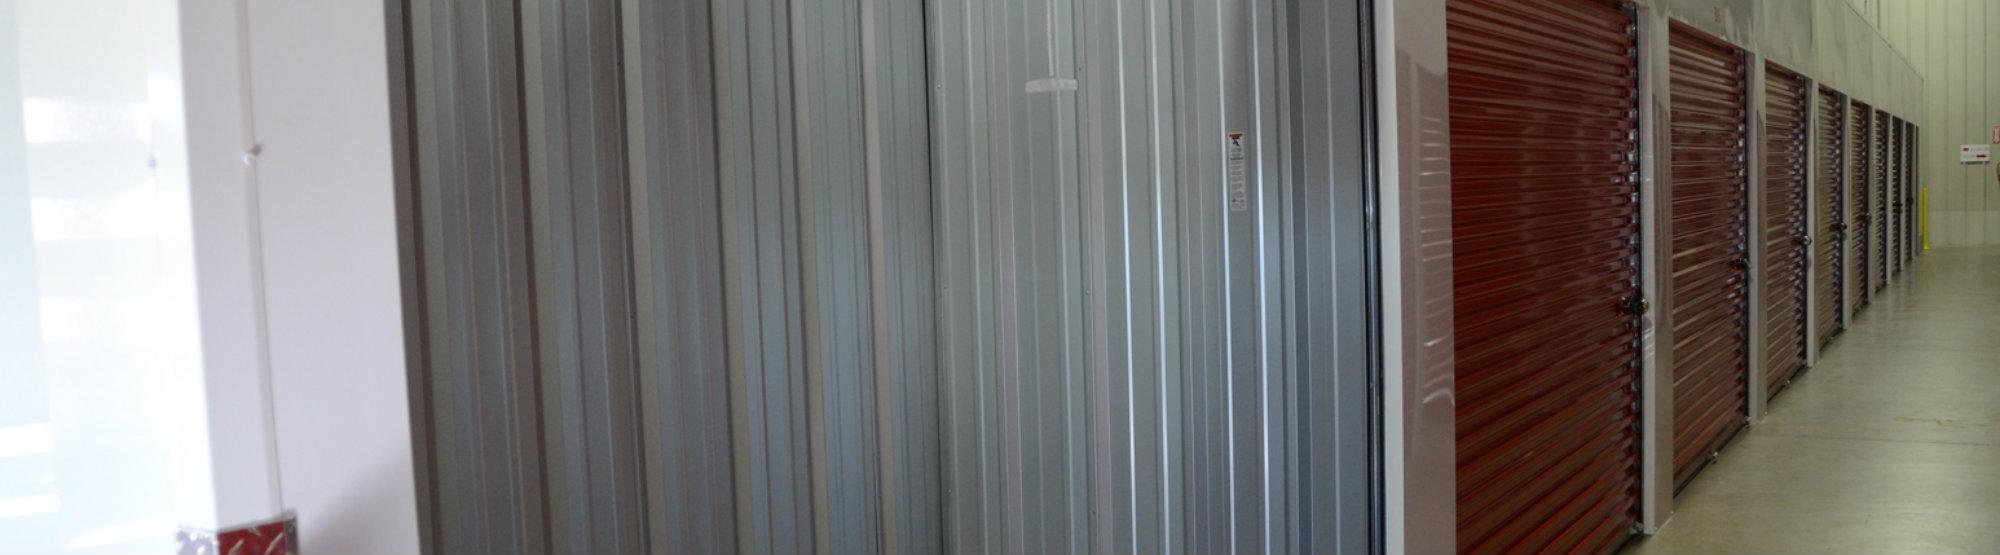 Interior Access Storage